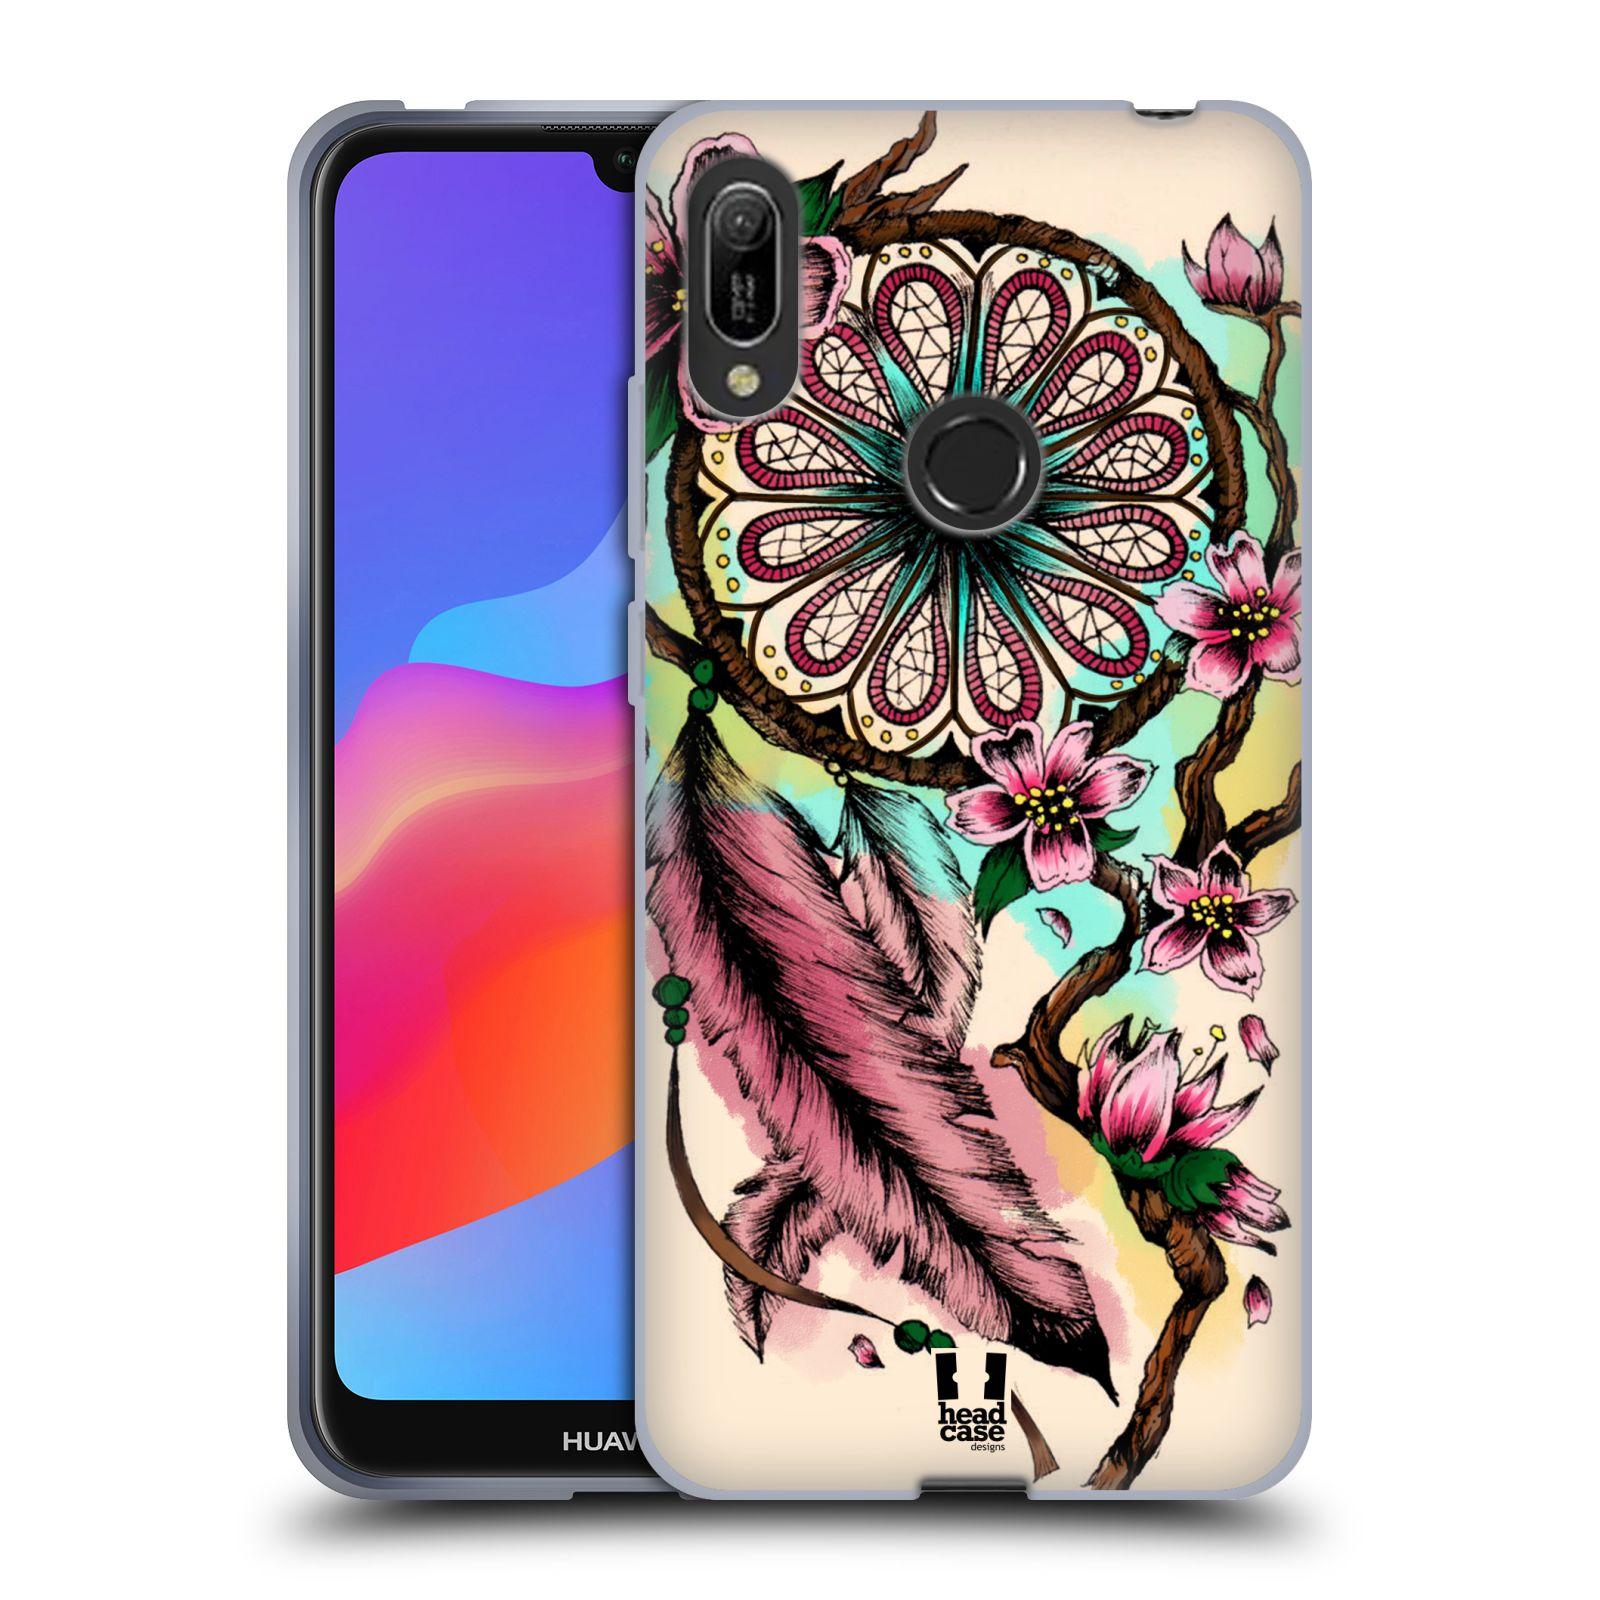 Silikonové pouzdro na mobil Huawei Y6 (2019) - Head Case - BLOOM BLOSSOMS